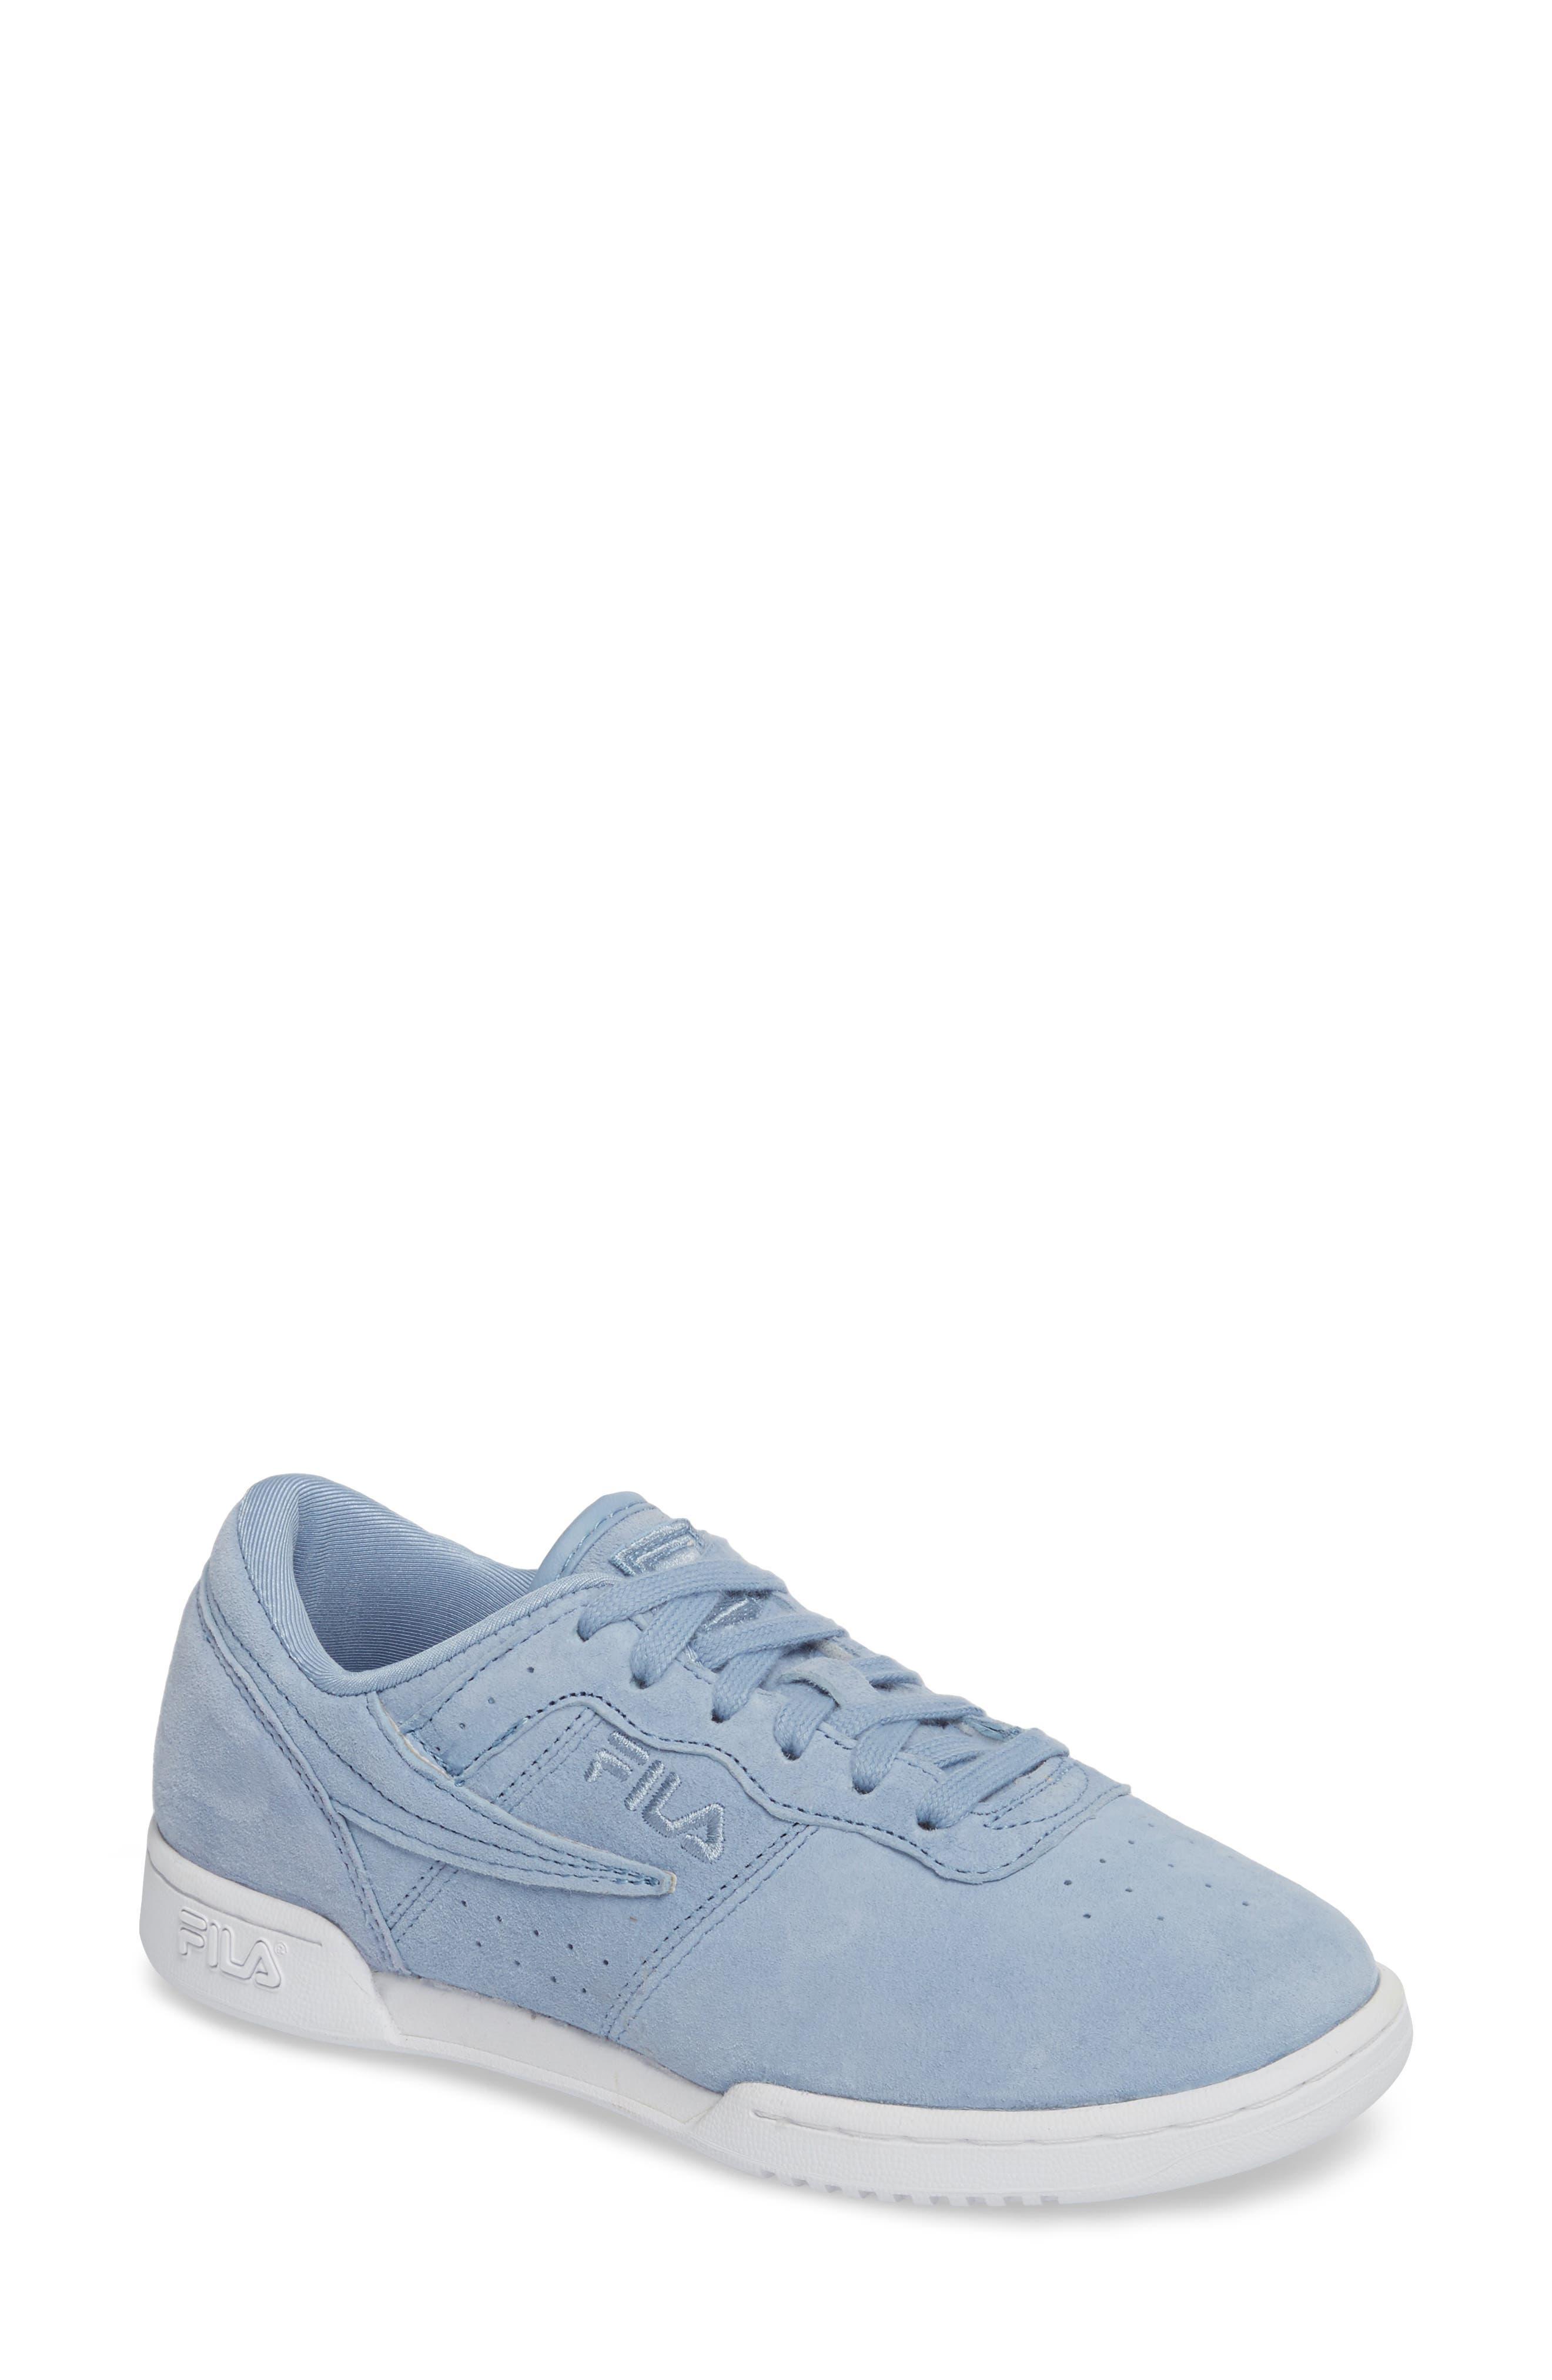 Original Fitness Premium Sneaker,                         Main,                         color, BLUE/ WHITE